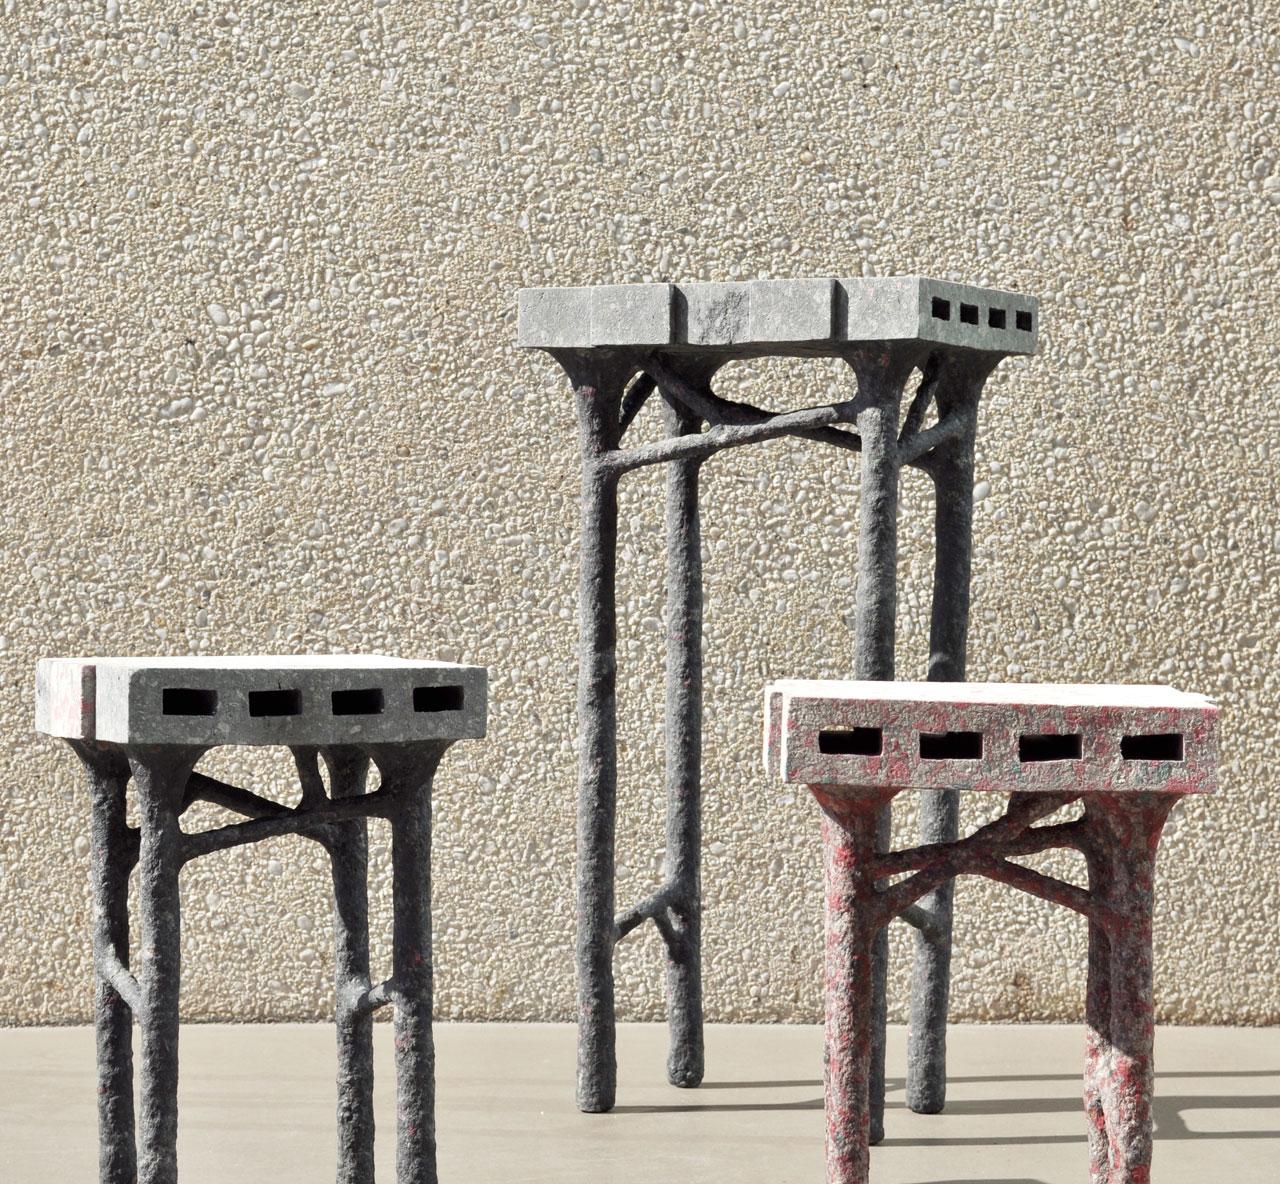 PaperBricks Sculpt series by WooJai Lee.